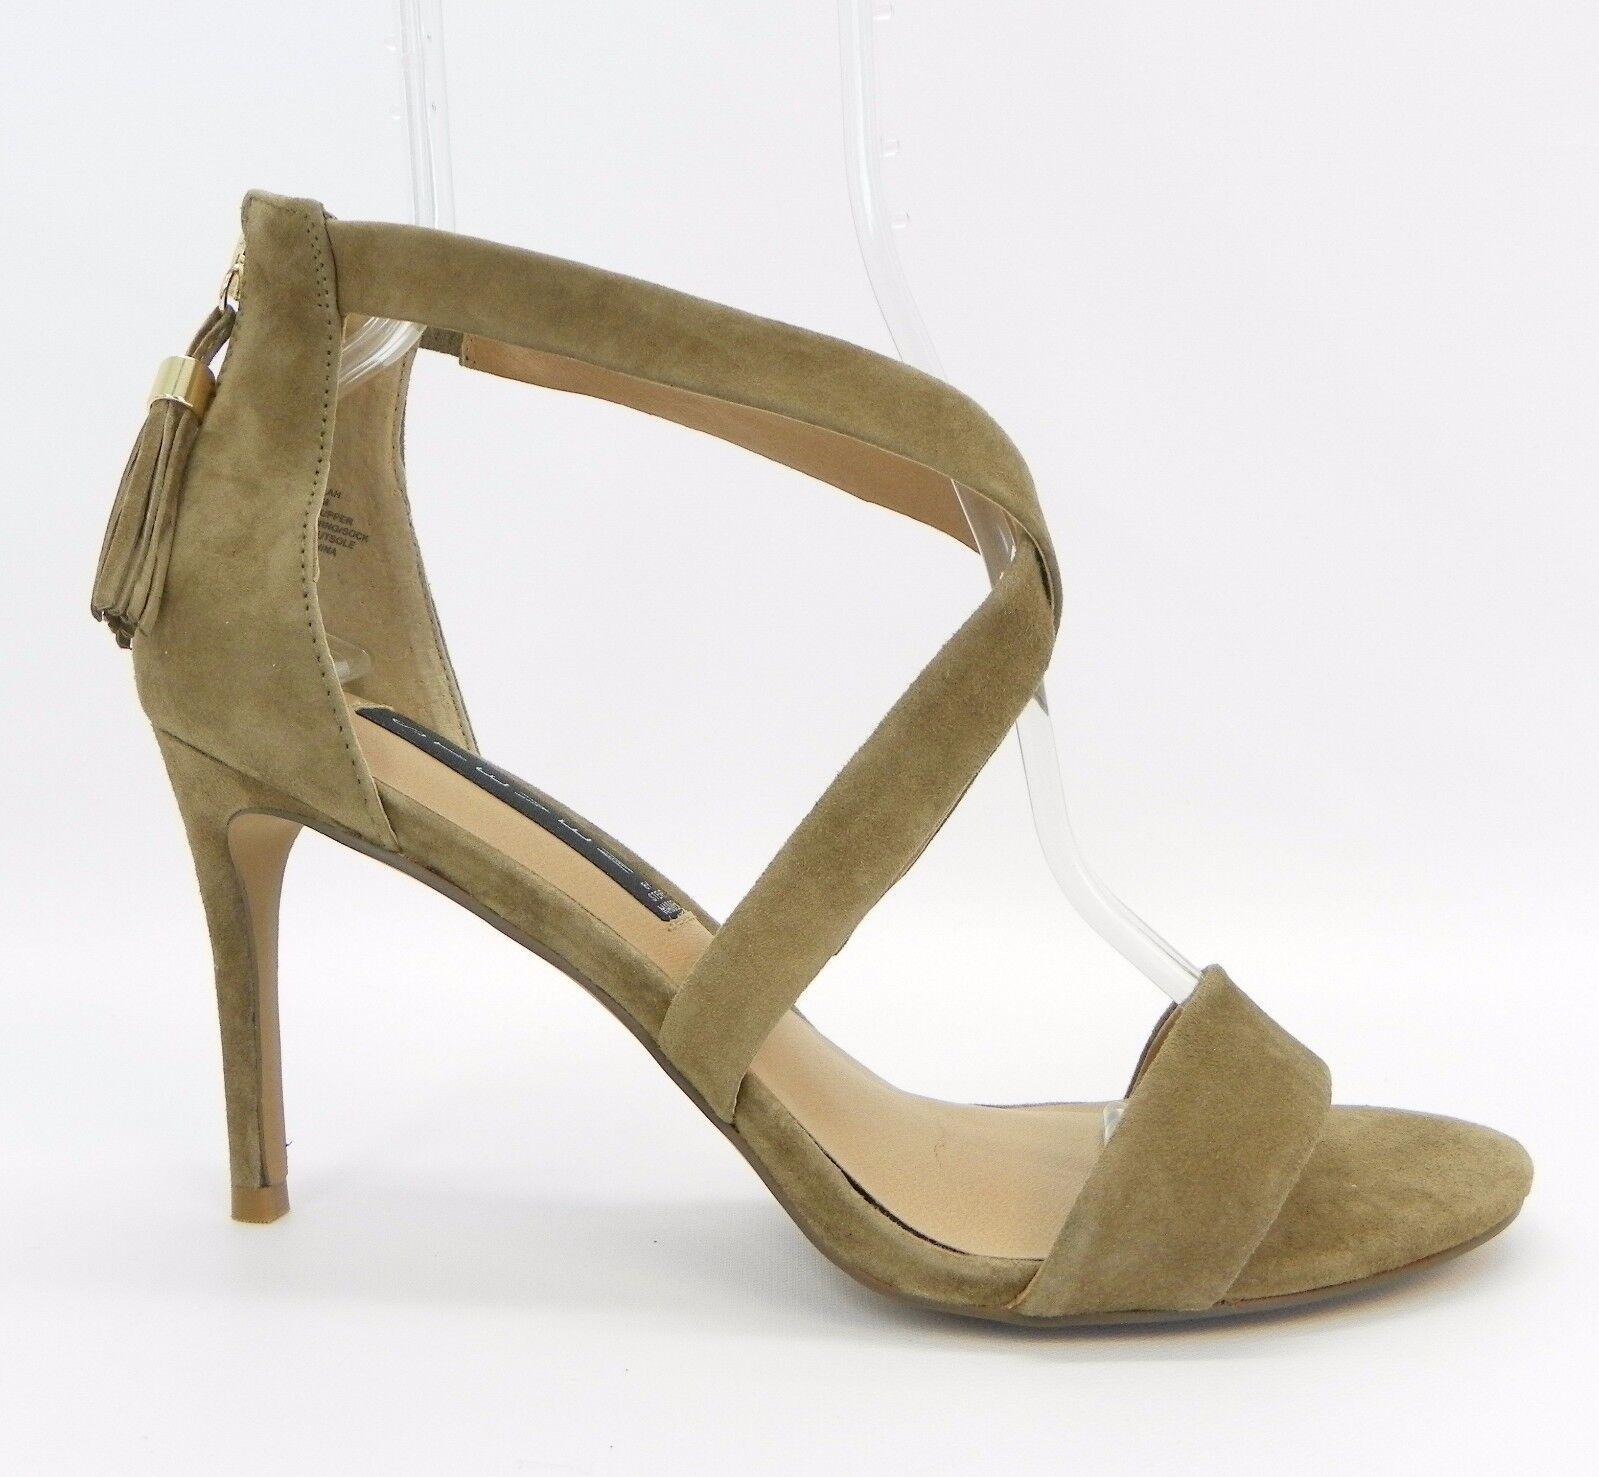 STEVEN Steve Madden chaussures Nahlah Open Toe Strappy Dress Sandal Taupe Suede 9.5 M